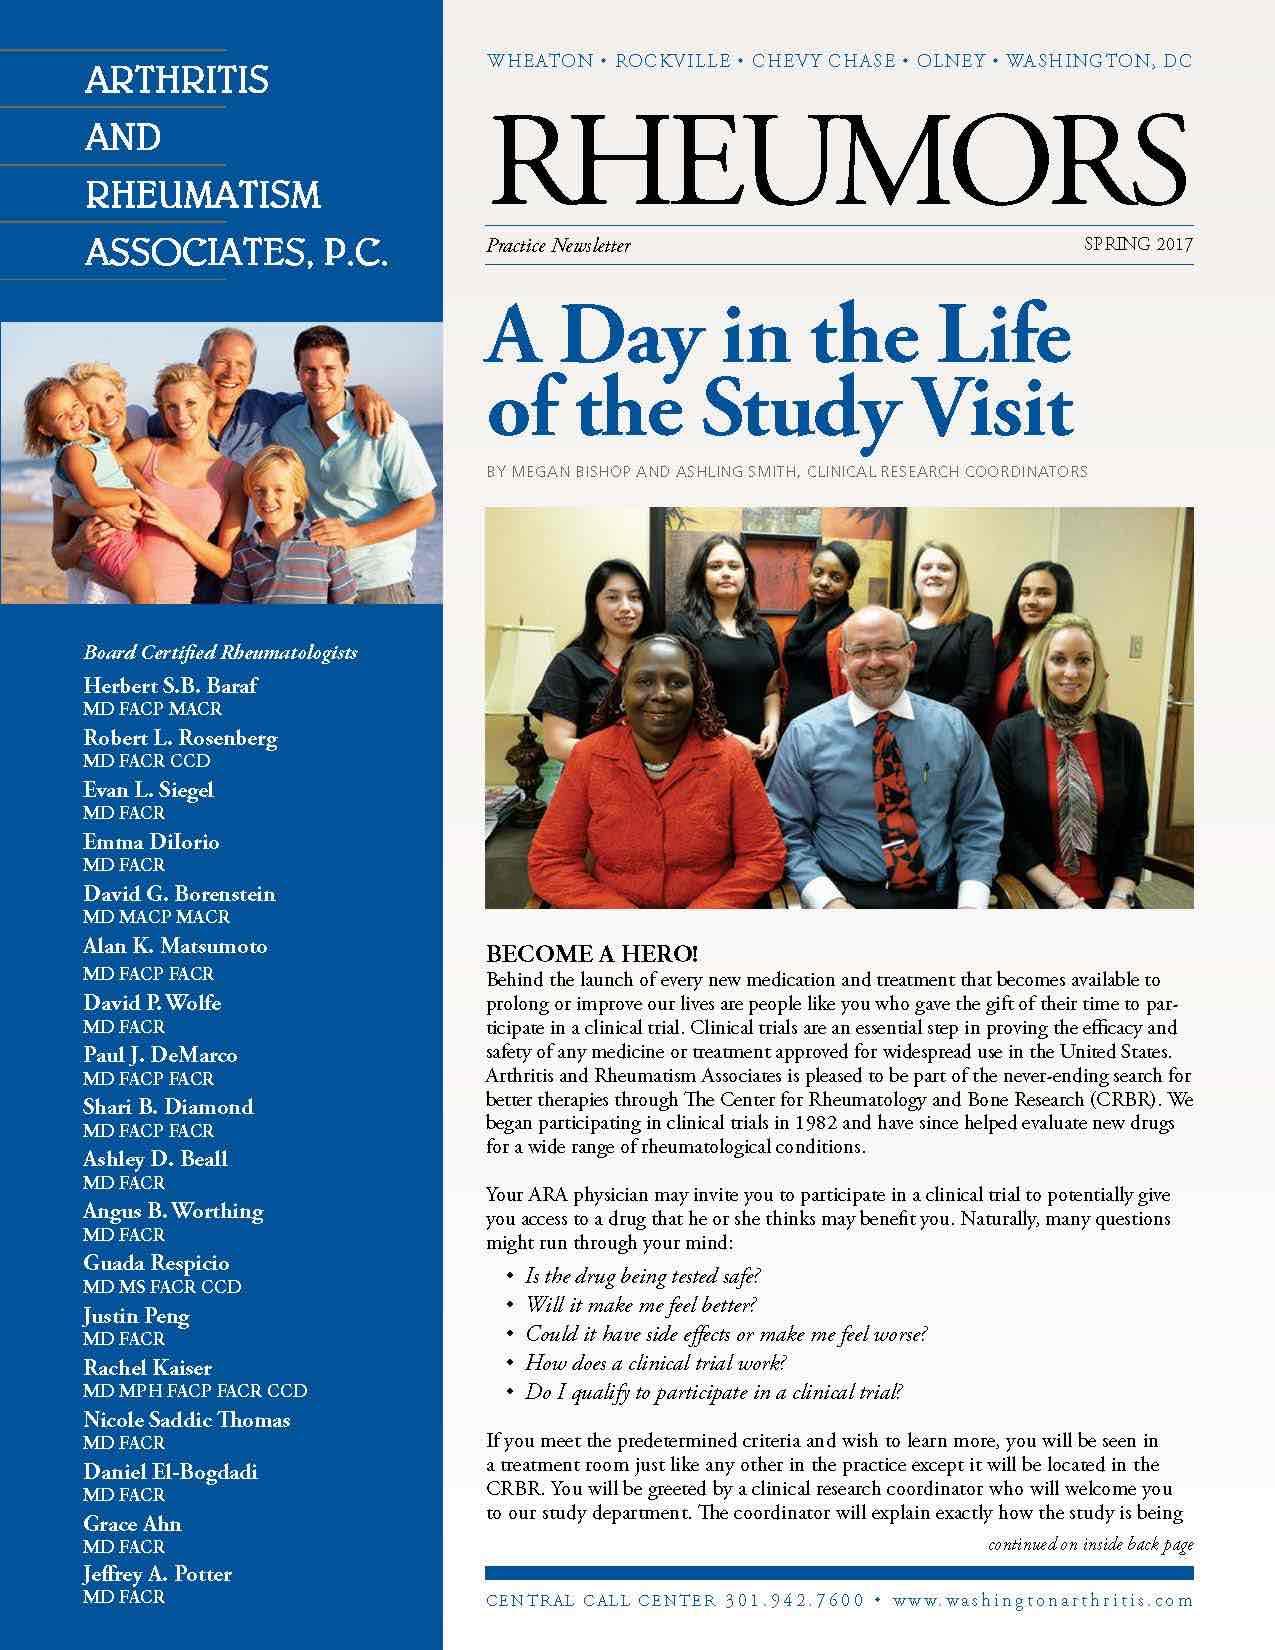 Arthritis and Rheumatism Associates, PC, physician newsletter, rheumatology newsletter, Rheumors